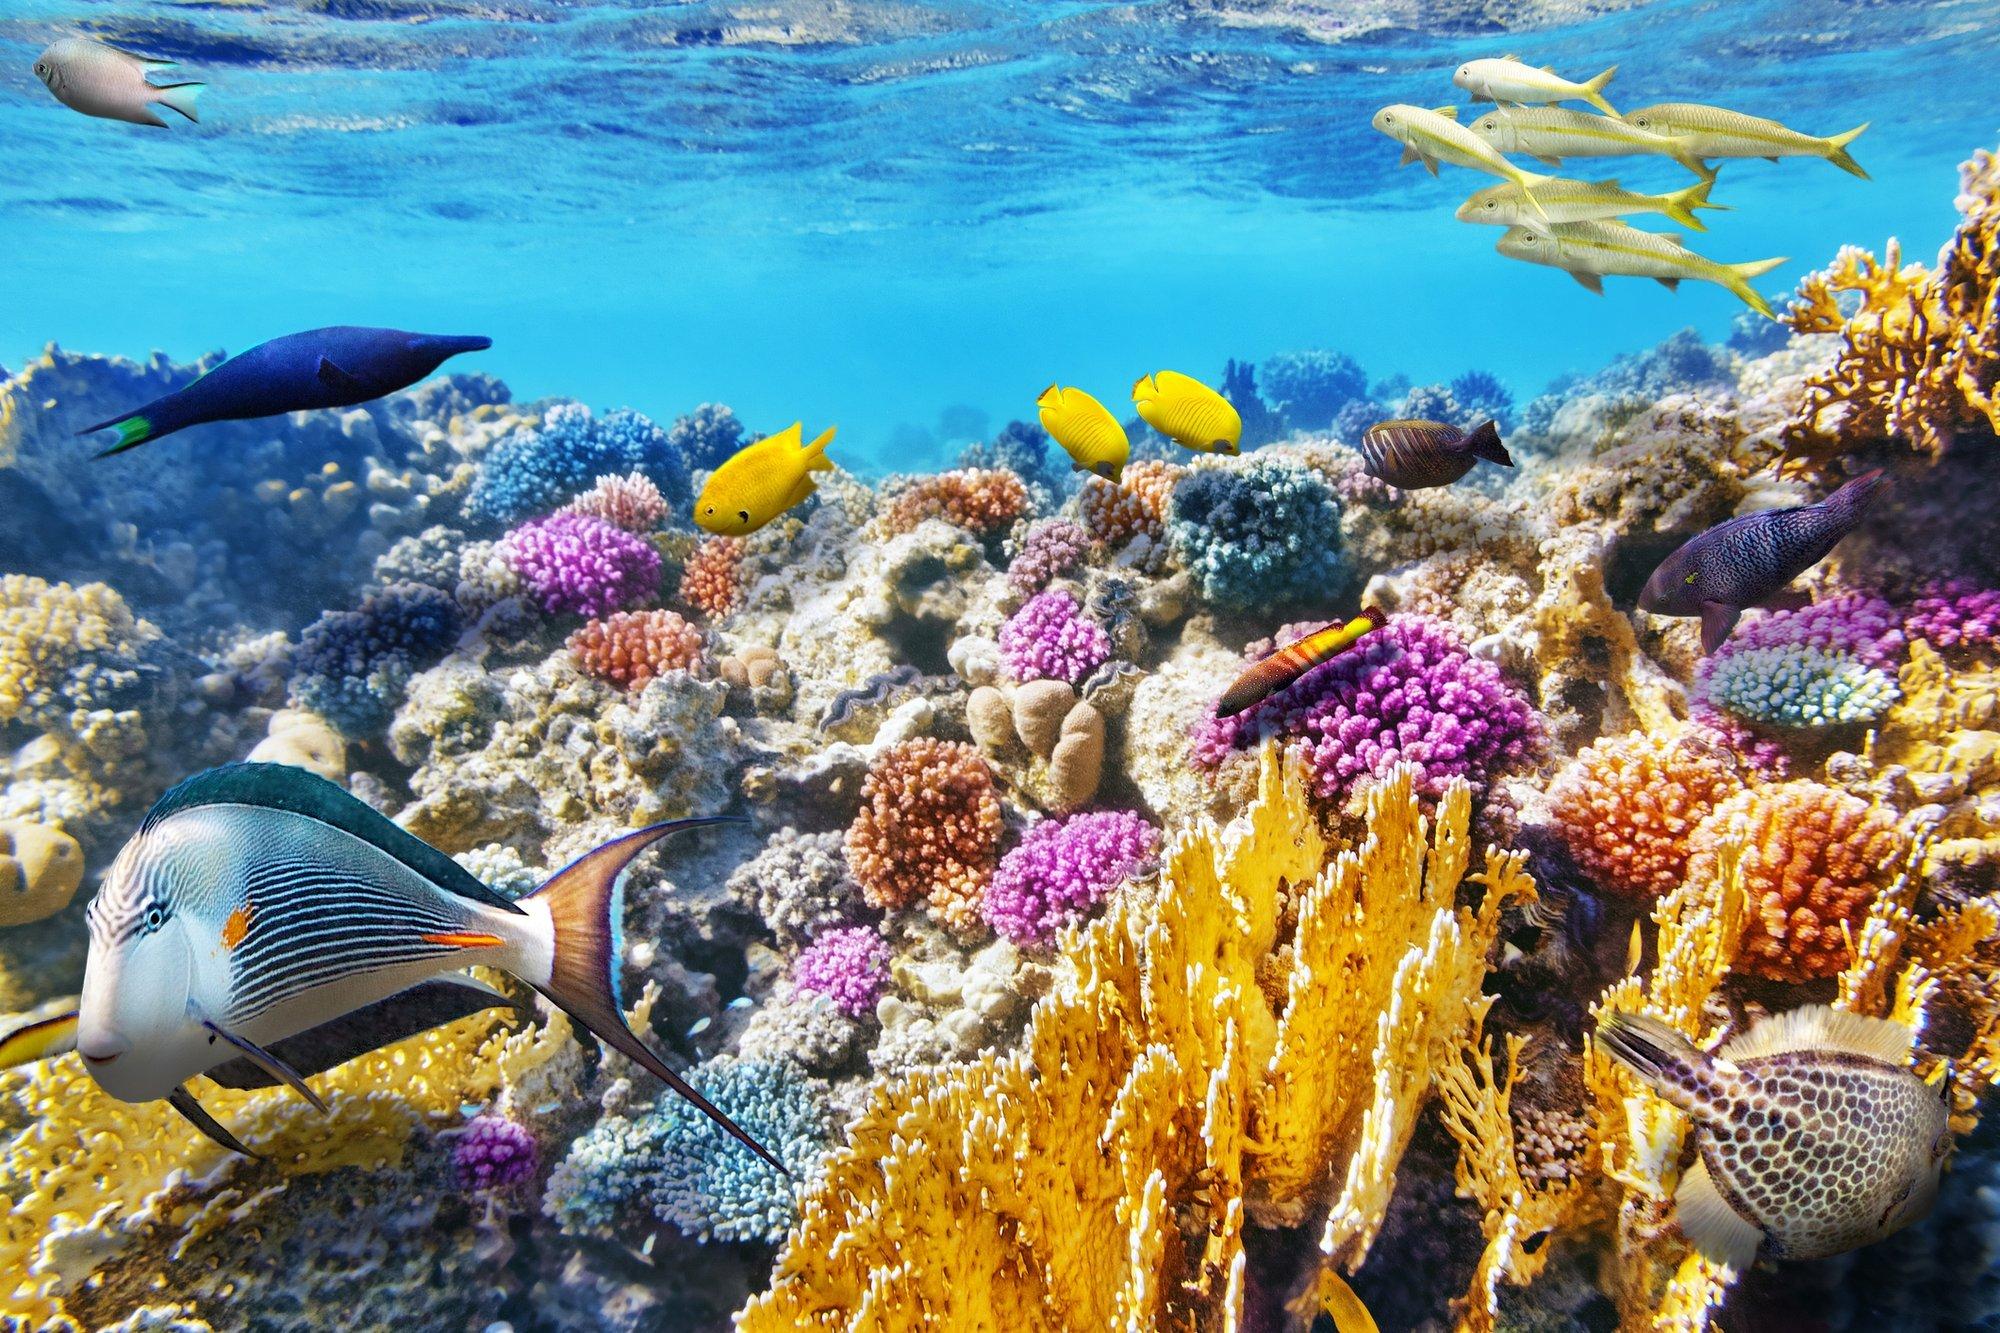 Marine Reserve, Ambergris Caye